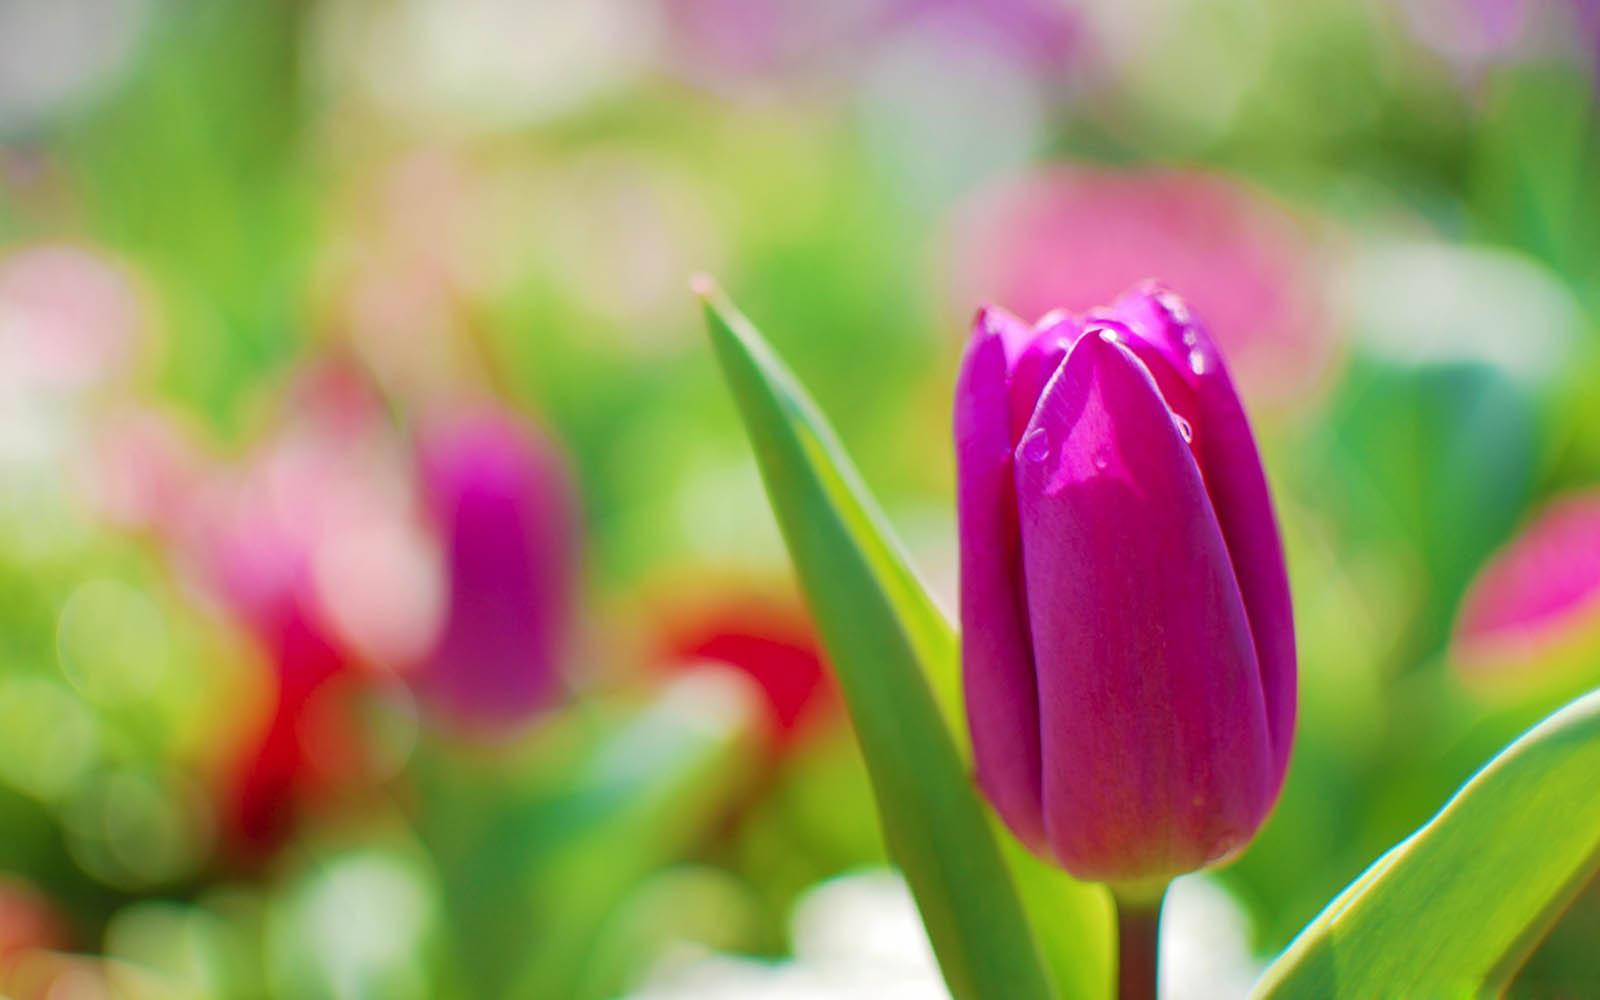 Wallpaper Tulips Flowers Wallpapers - High Resolution Tulips Flower , HD Wallpaper & Backgrounds